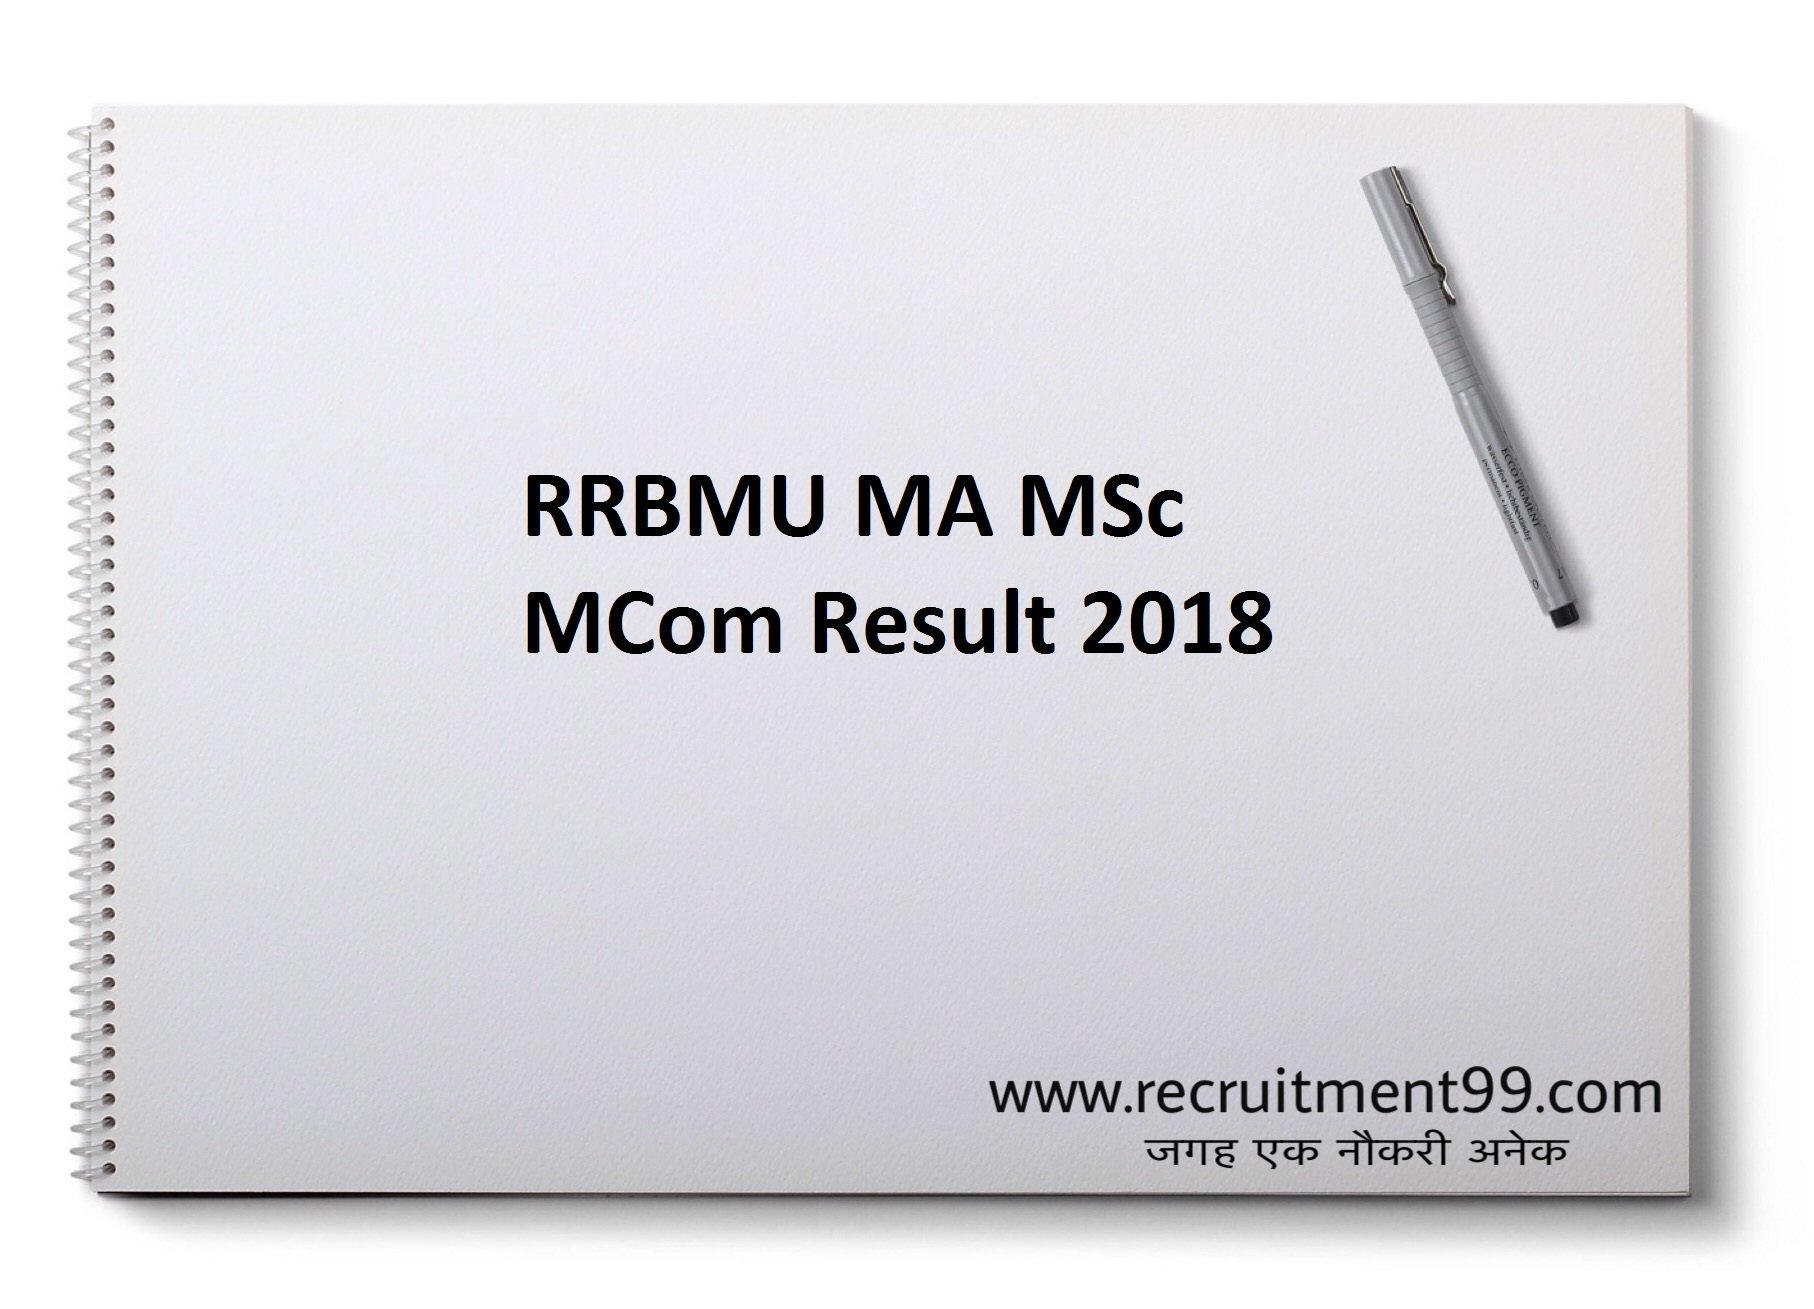 RRBMU PG MA MSc MCom Result 2018